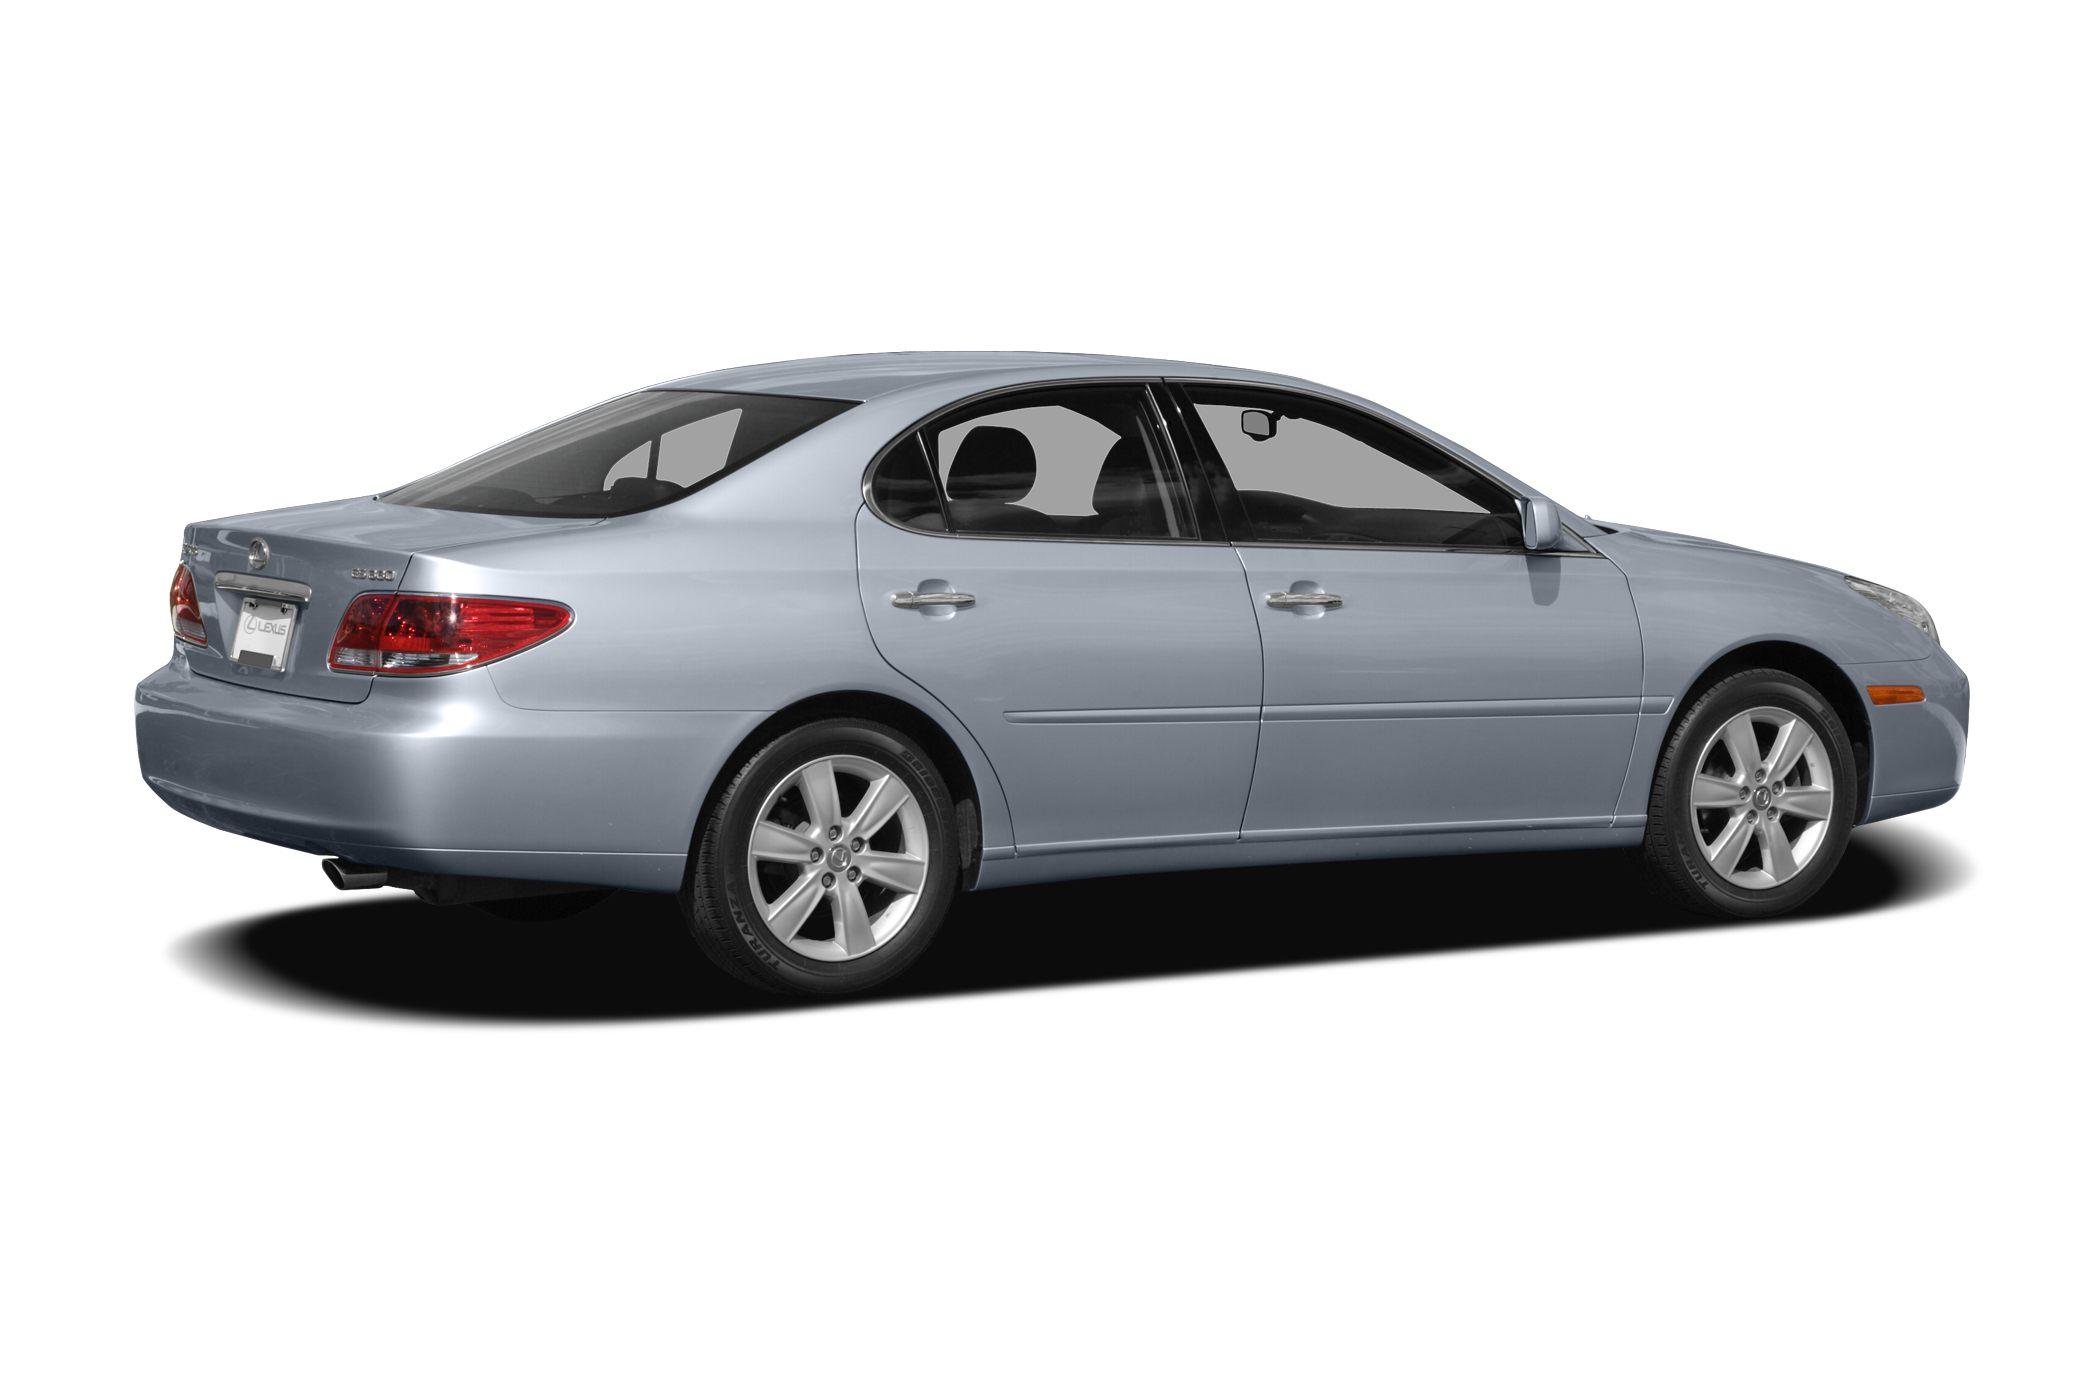 2006 Lexus ES 330 Sedan for sale in Jacksonville for $22,870 with 29,585 miles.